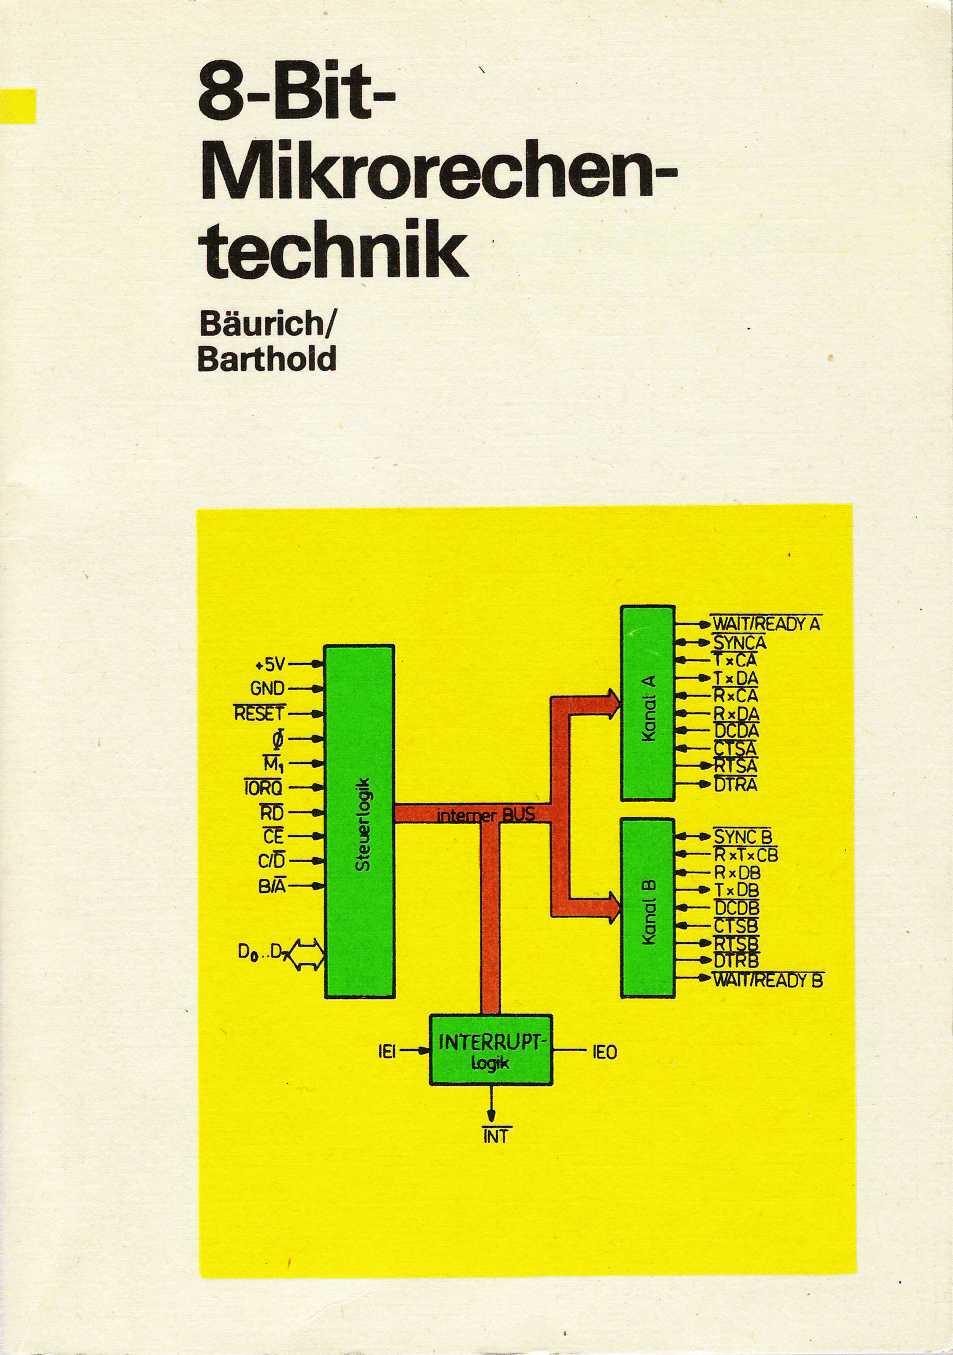 8-Bit-Mikrorechentechnik image, screenshot or loading screen